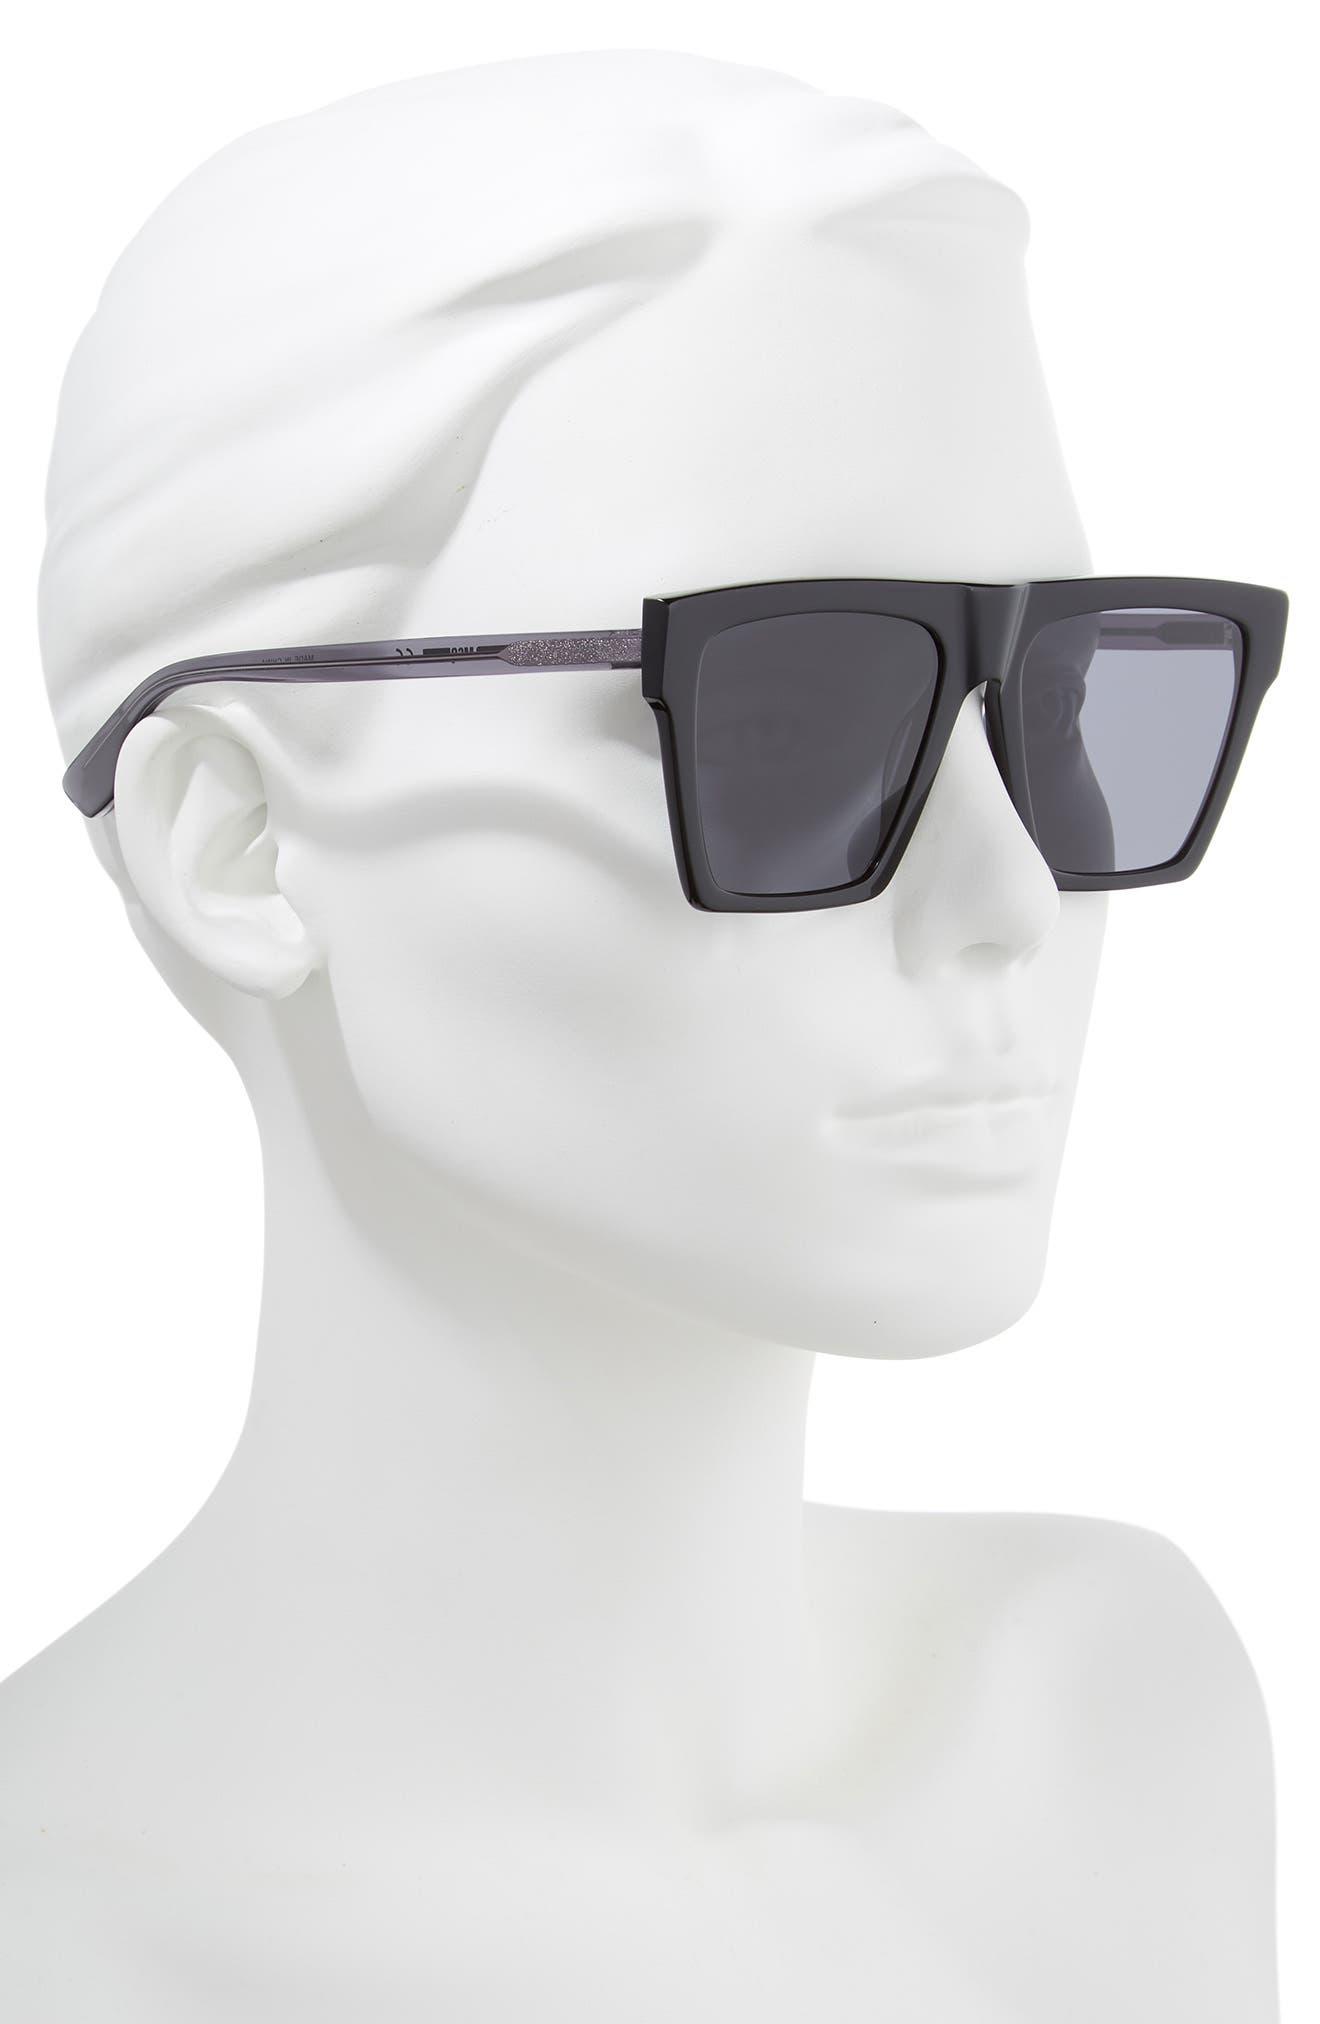 Alexander McQueen 54mm Flat Top Sunglasses,                             Alternate thumbnail 2, color,                             BLACK